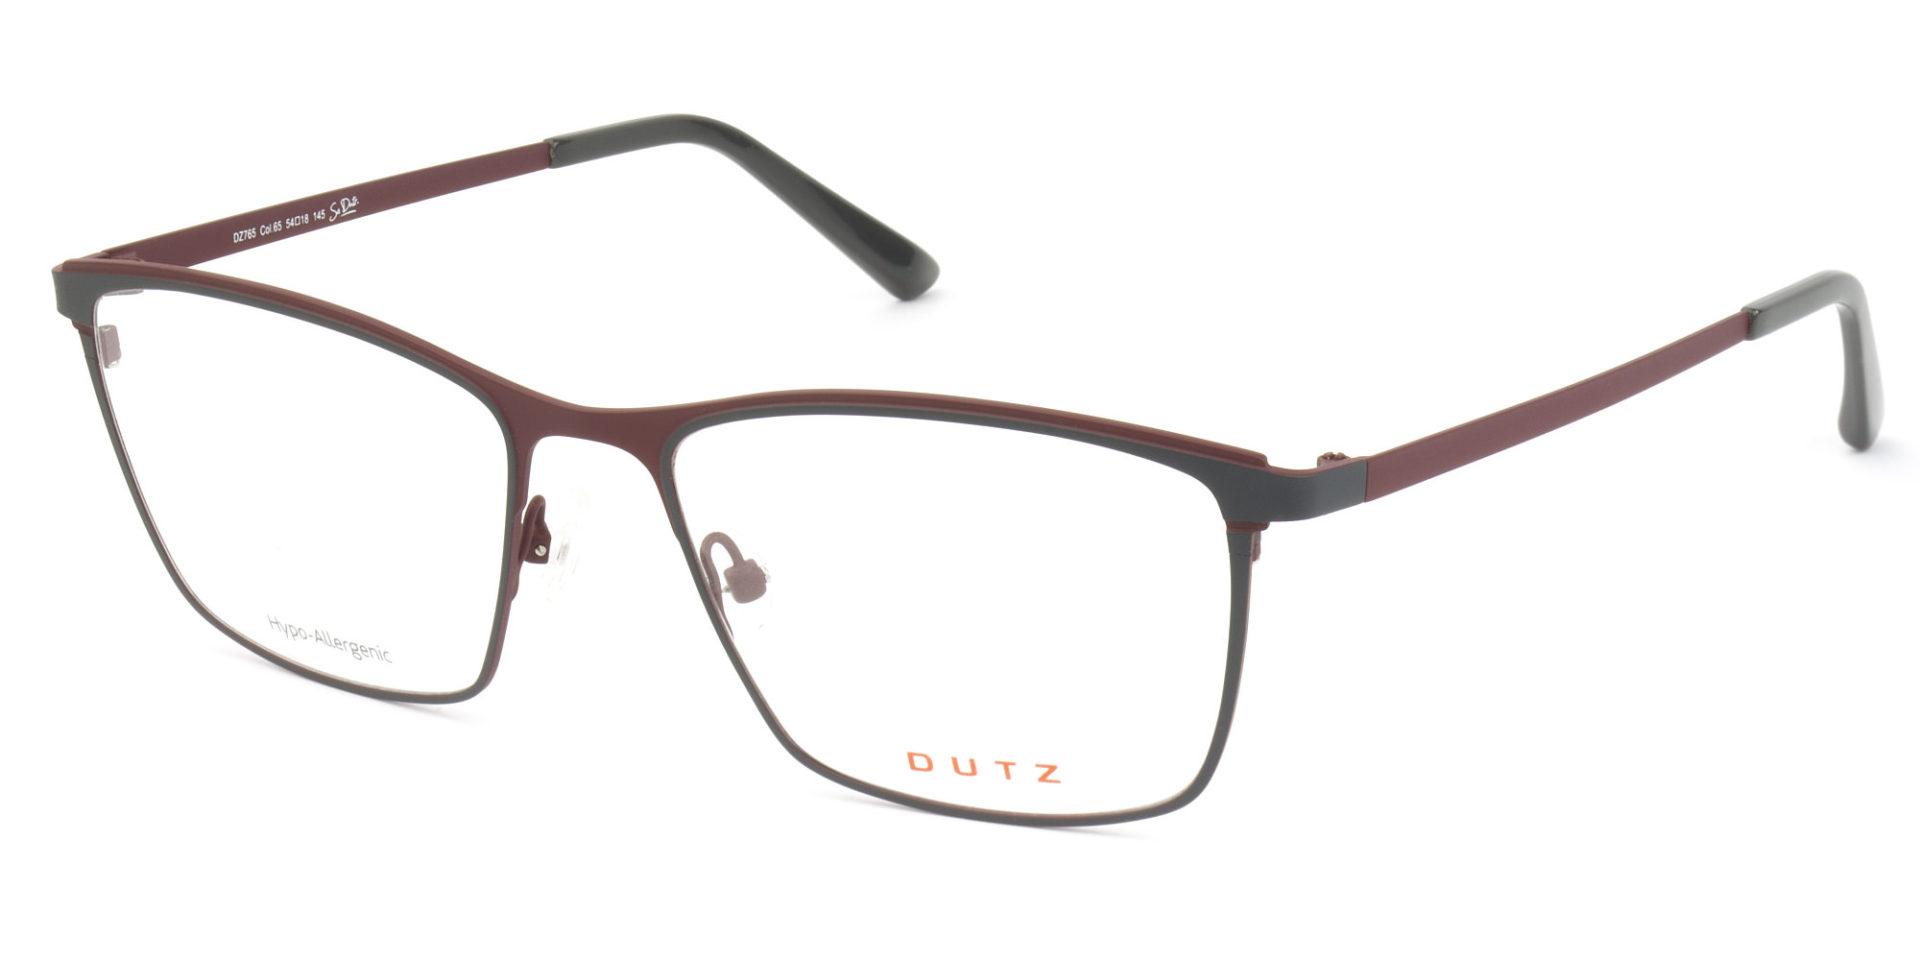 DZ765-65